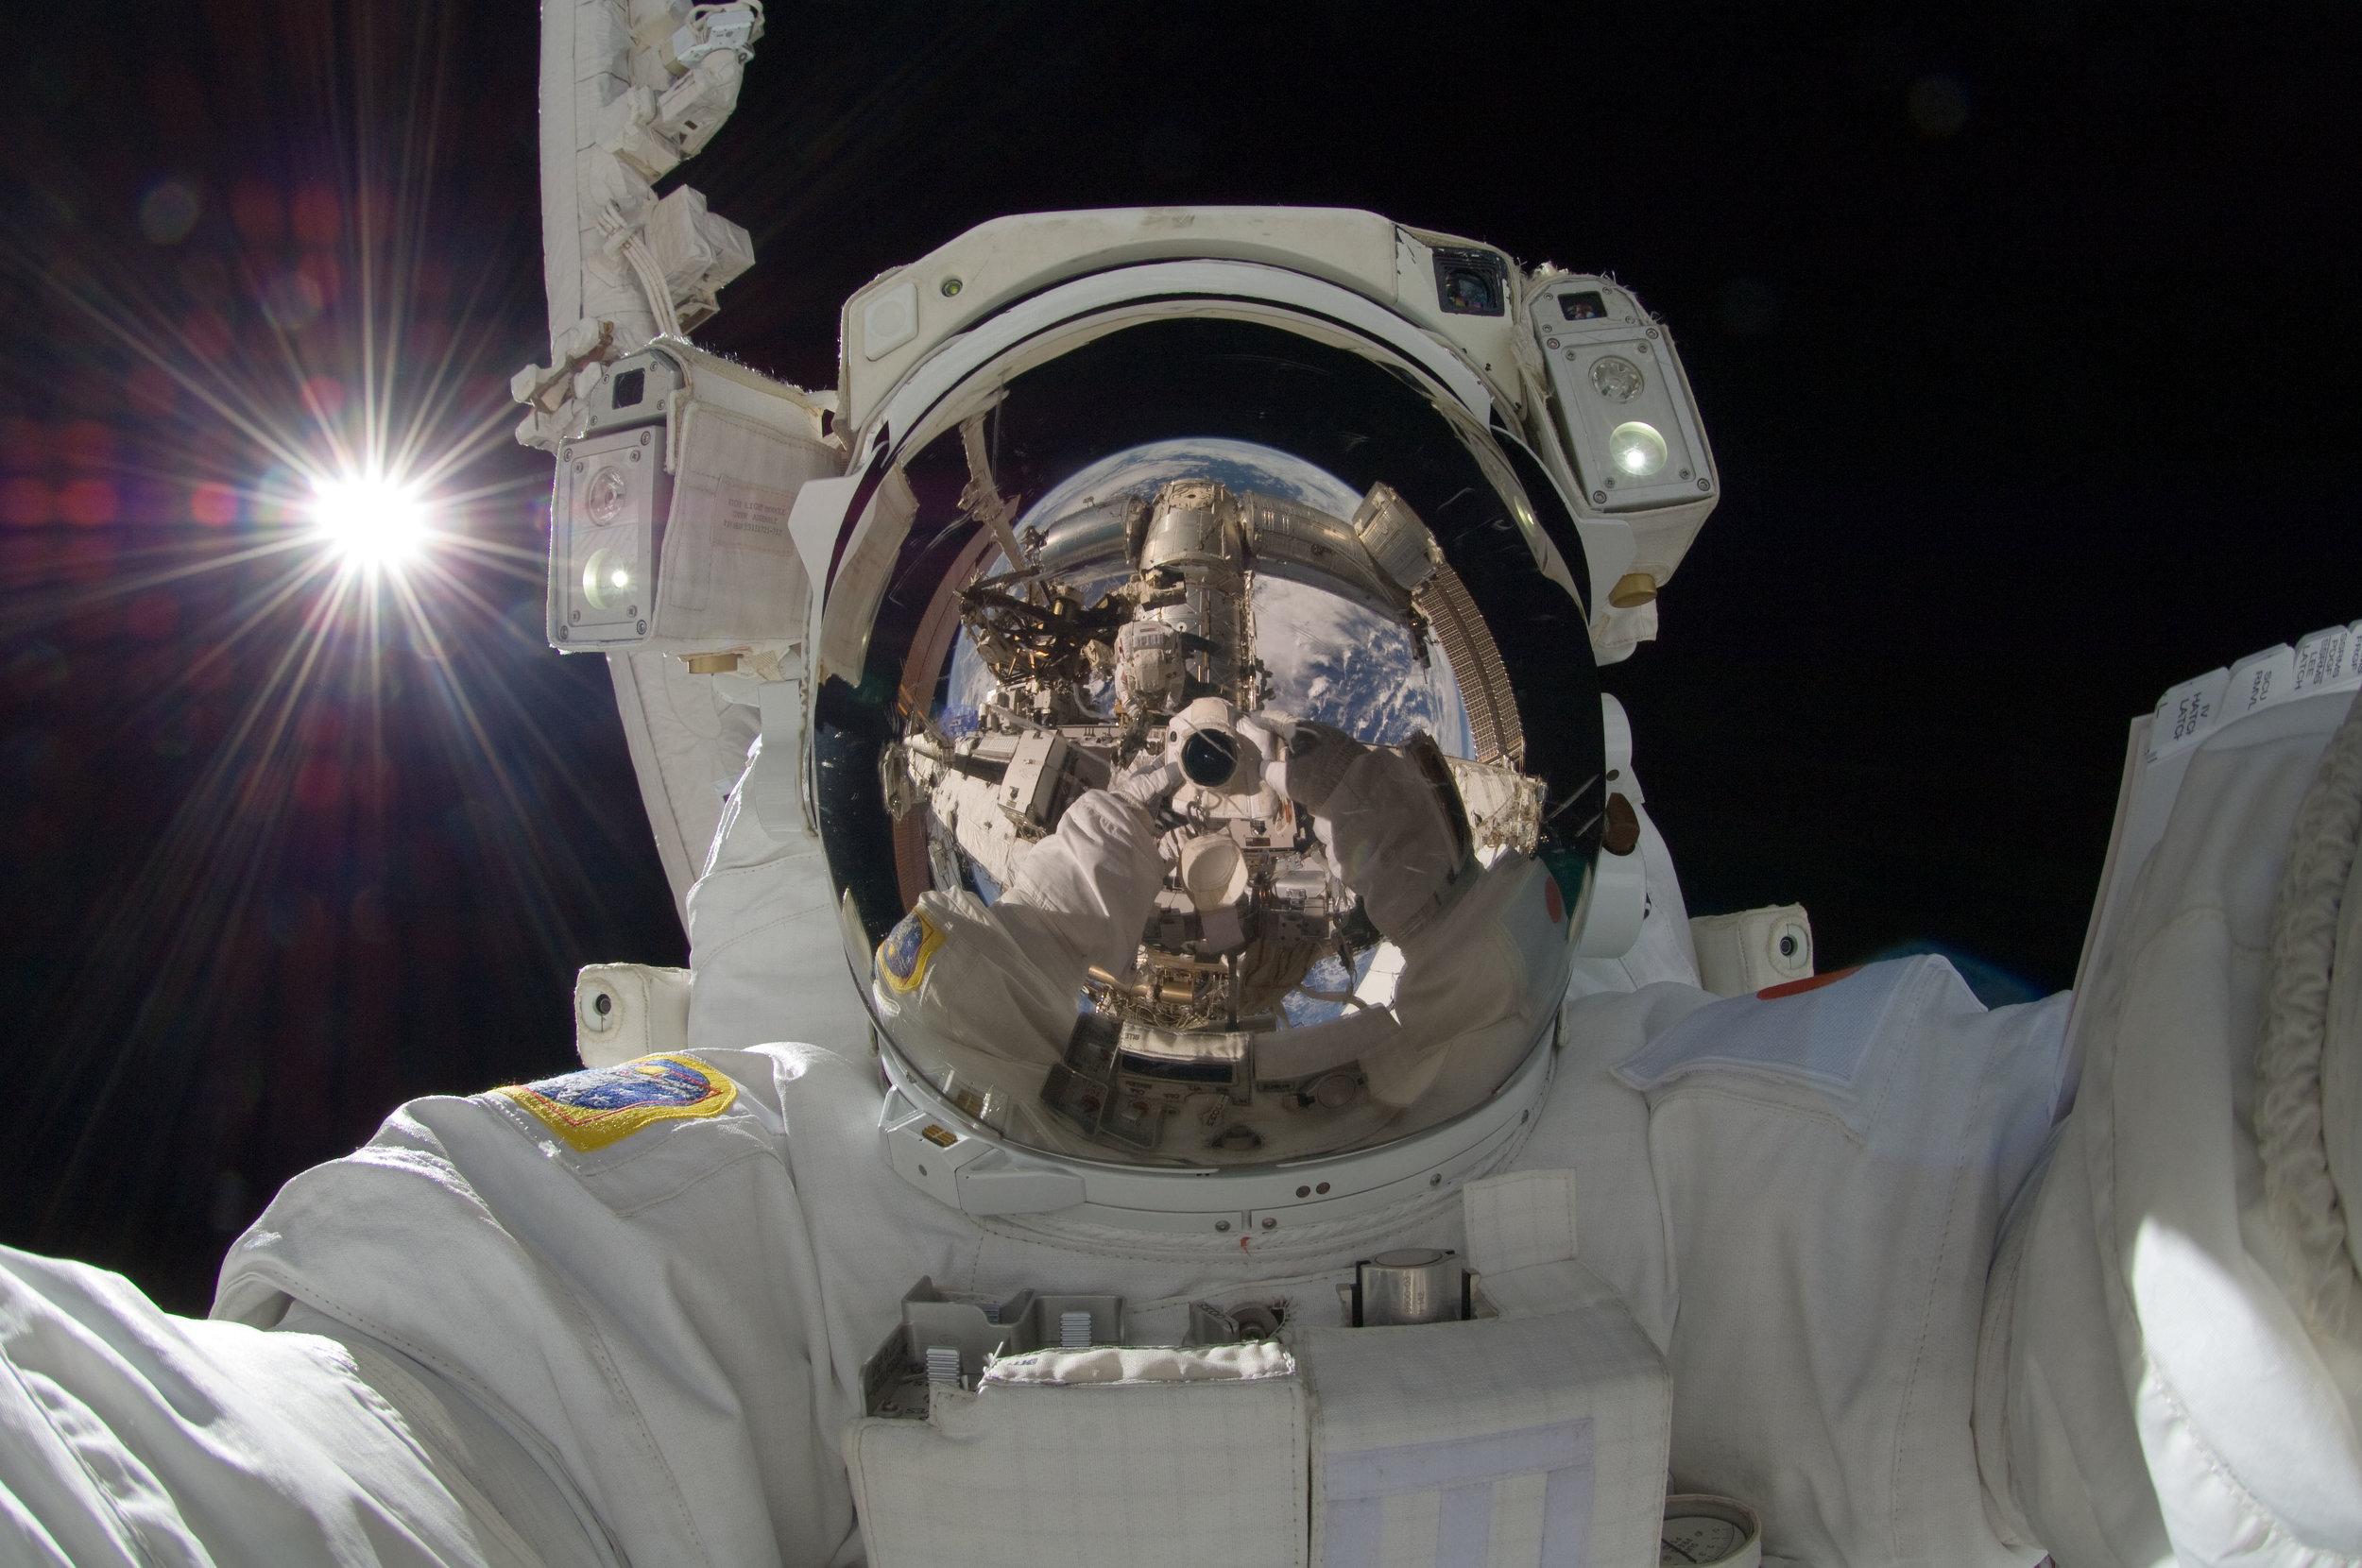 'Orbiting Astronaut Self-Portrait,' 2012